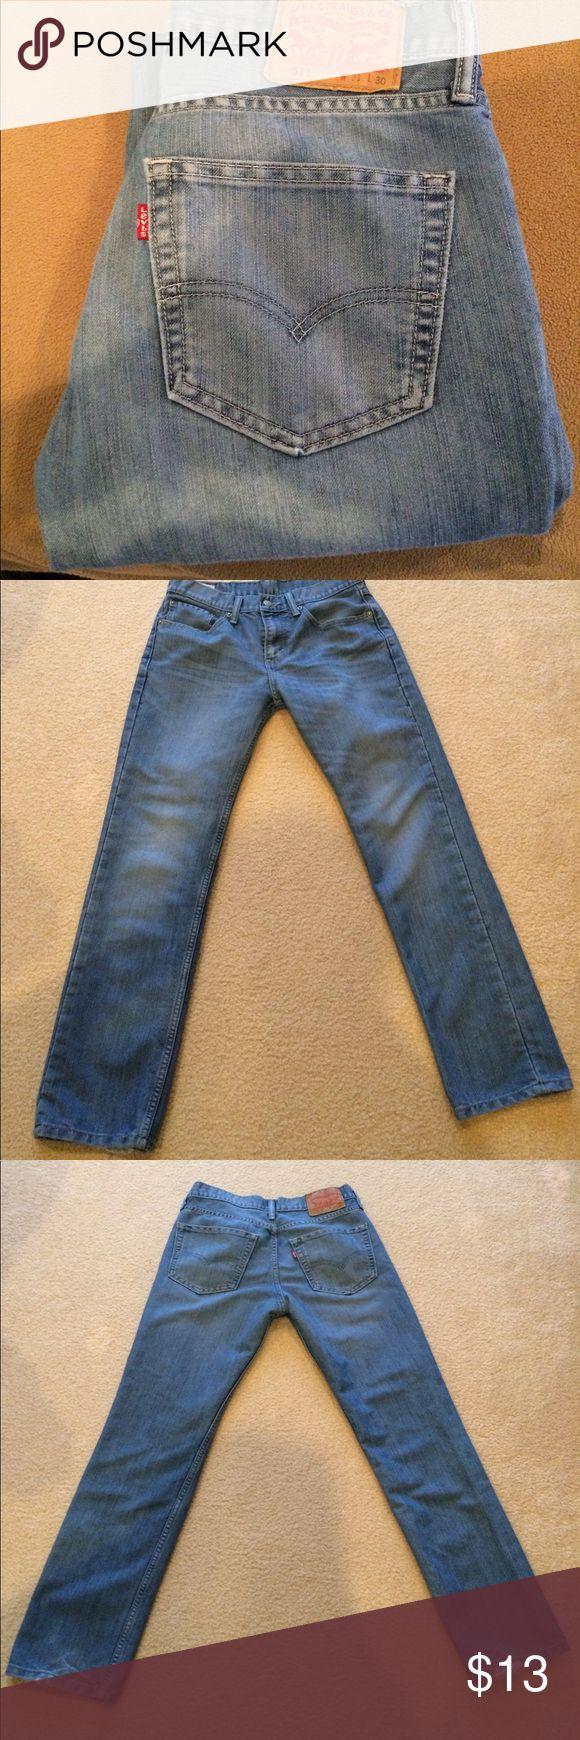 Levi's 511 Slim Levi's 511 Slim Jeans. Size 31/30 Levi's Jeans Slim Straight